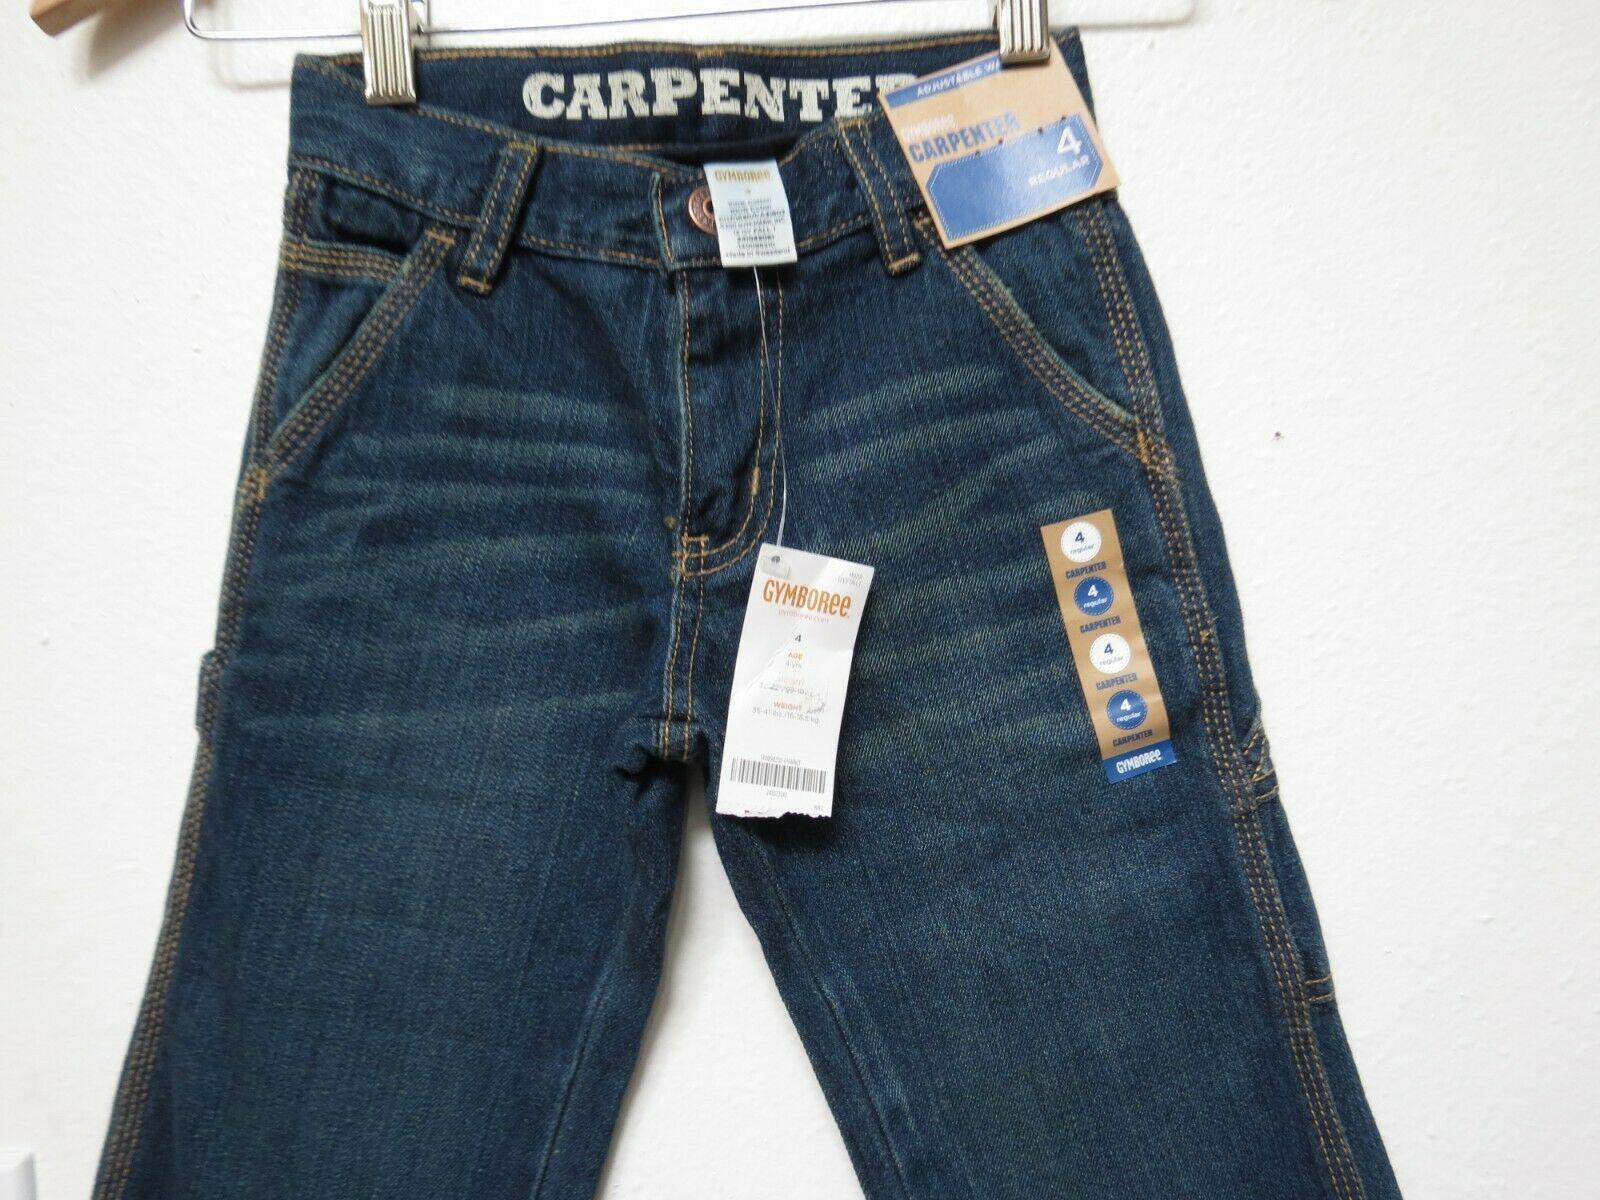 Gymboree Girls Clothes Multiple Sizes Dark Wash Blue Super Skinny Fit Kids Jeans